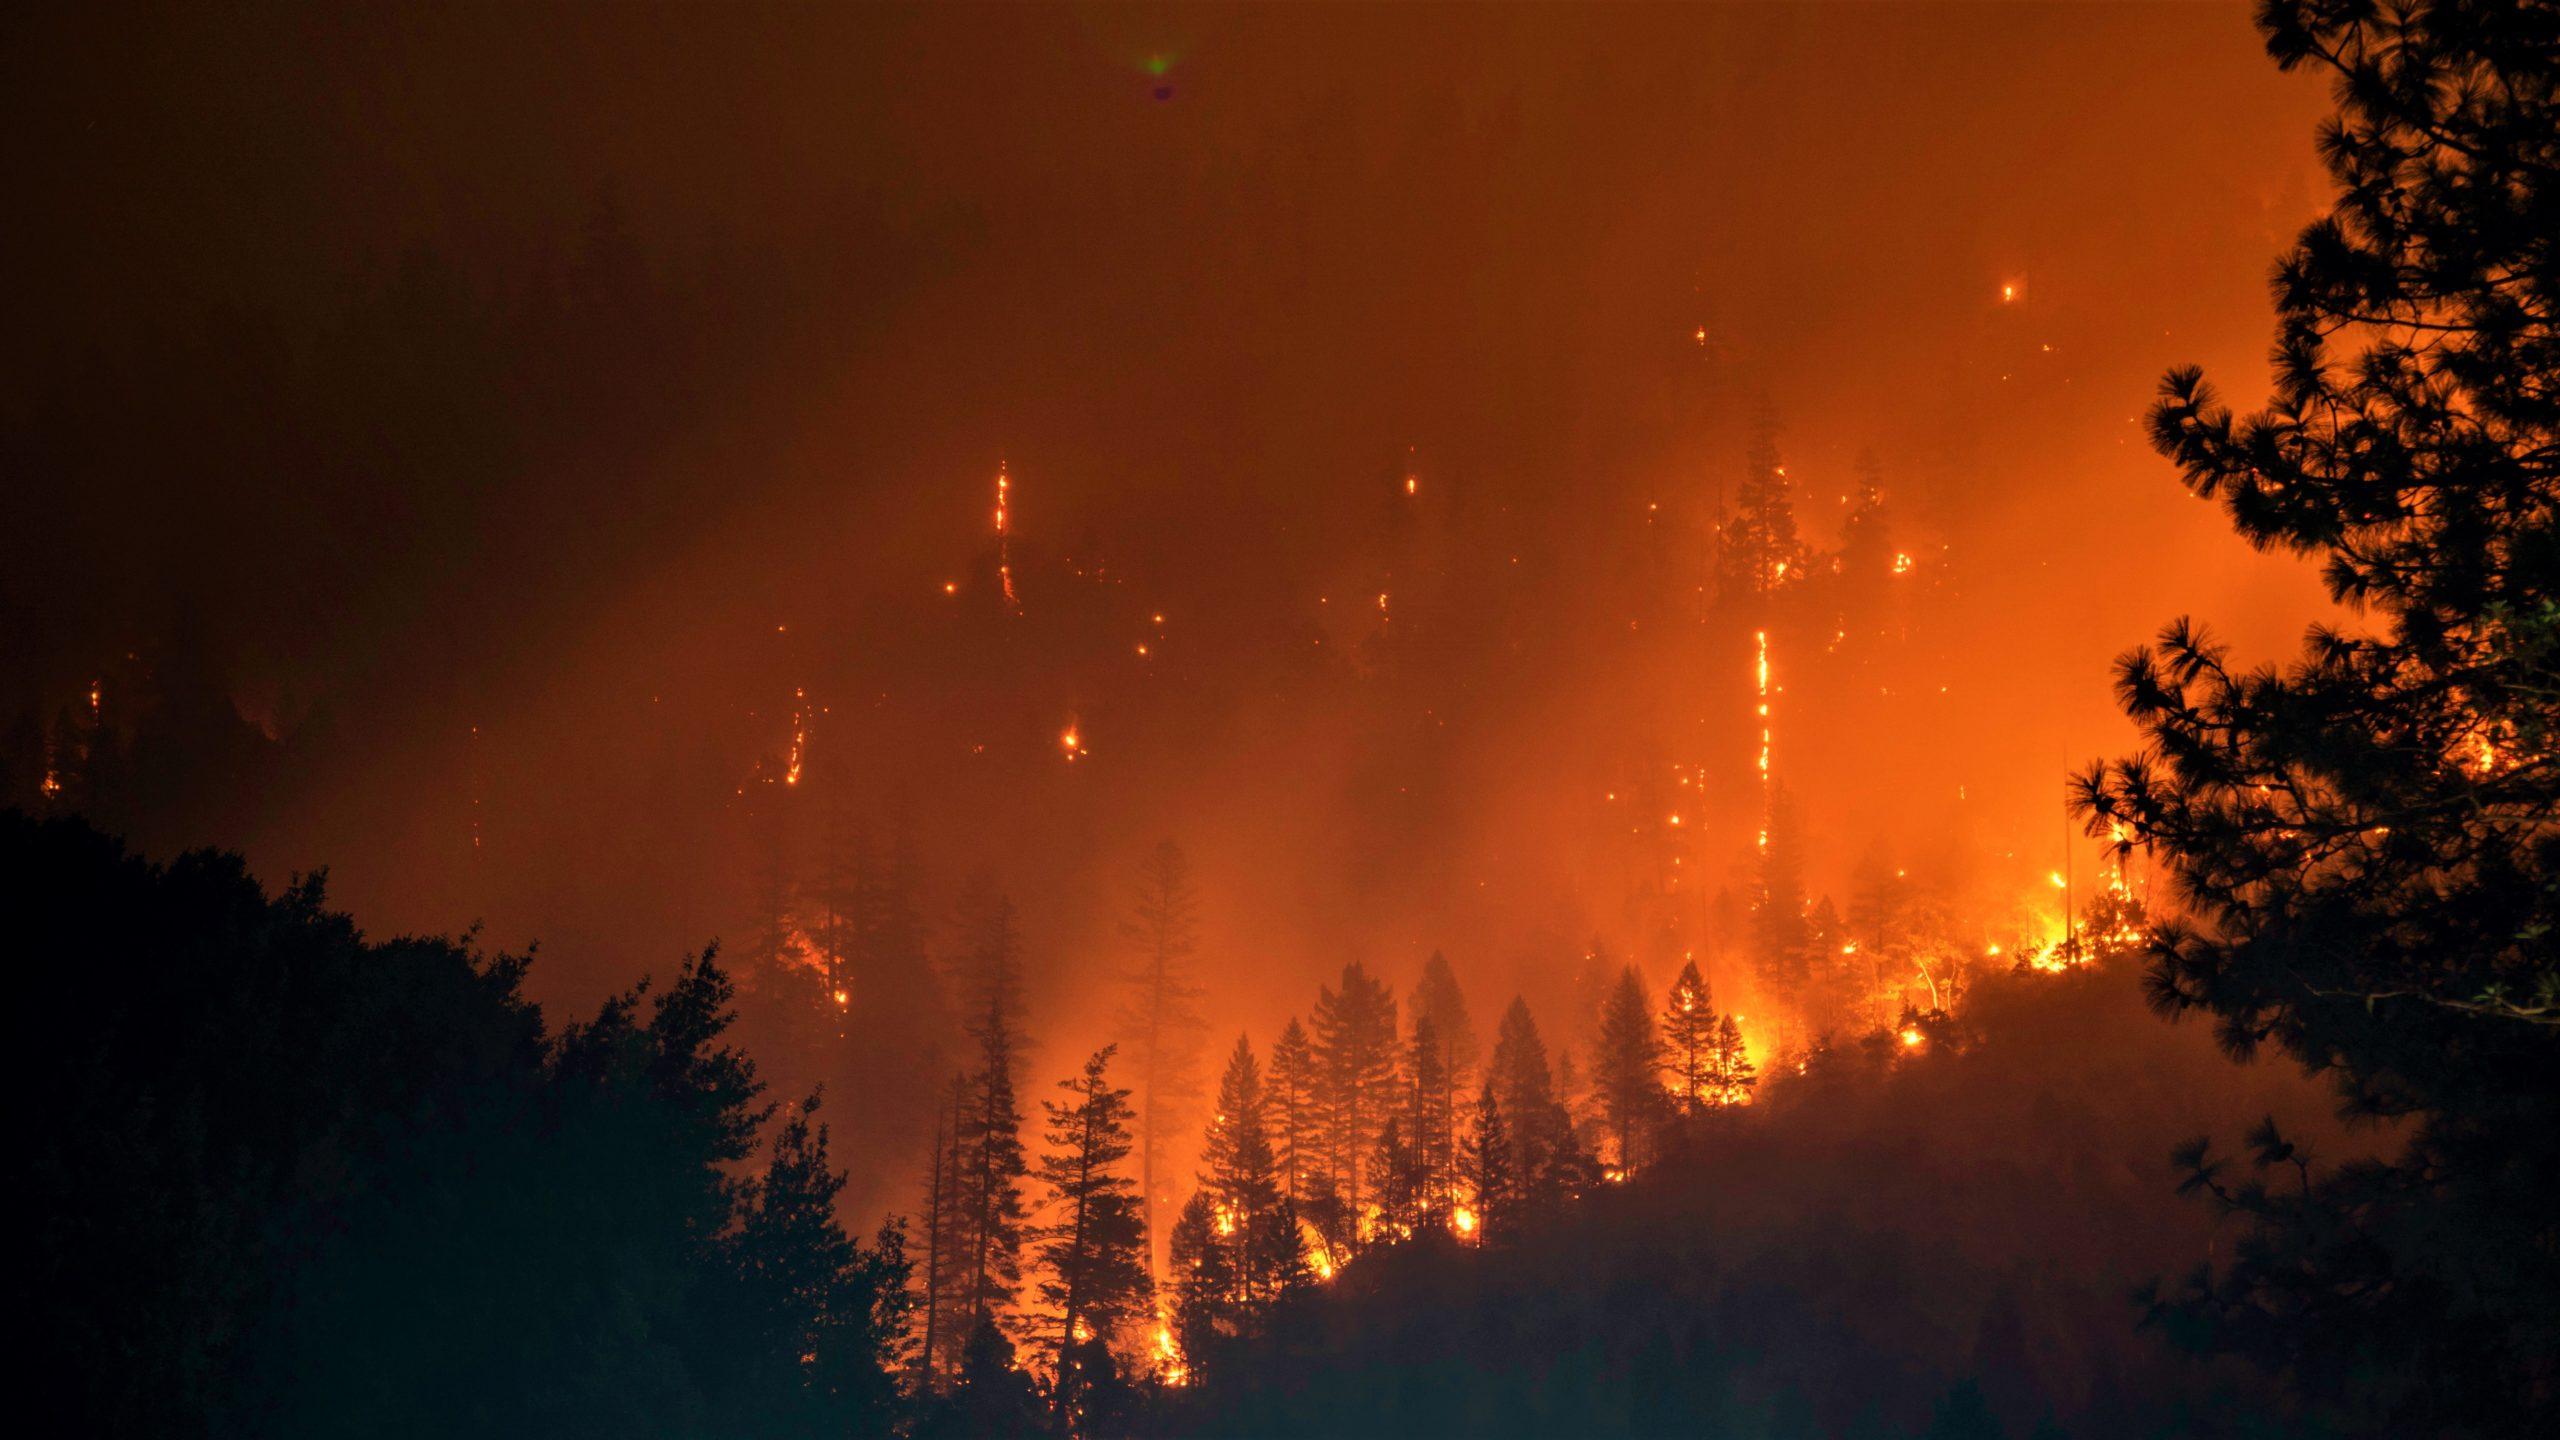 Burning forest in Klamath National Forest, Yreka, USA. By Matt Howard